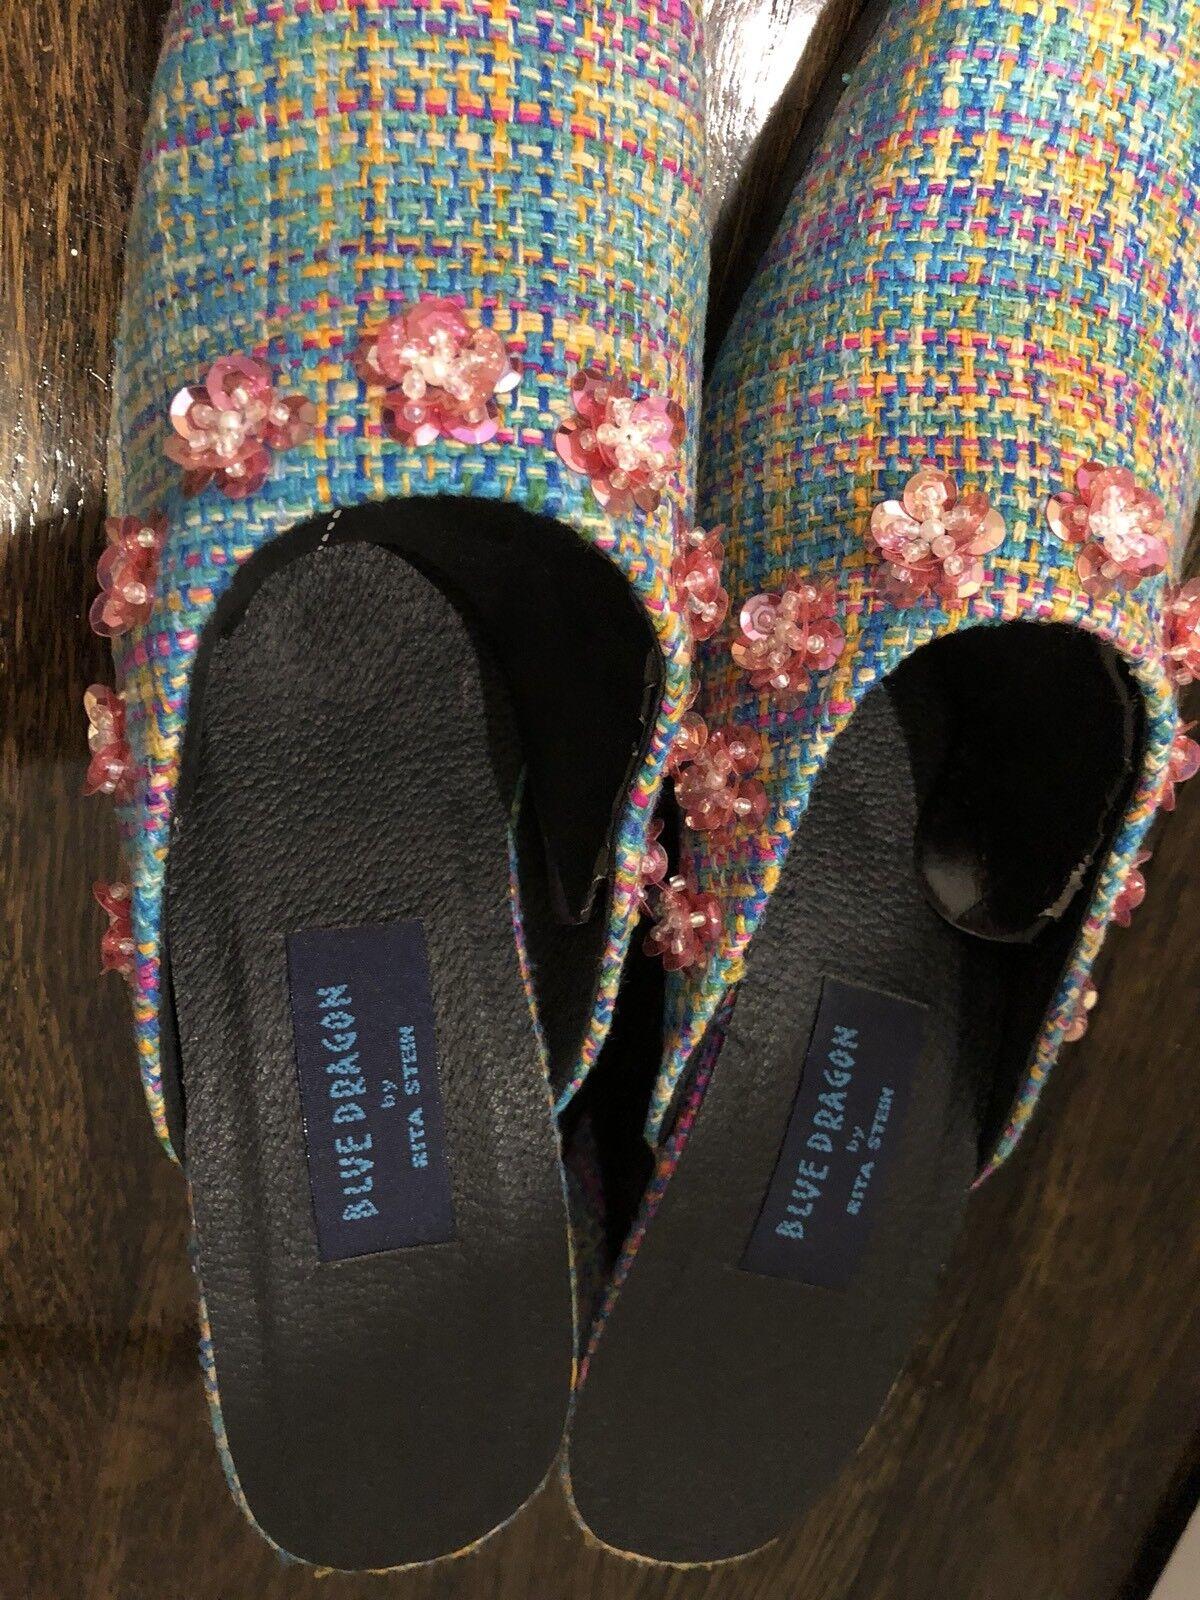 New Blau Dragon By Blau Rita Stein Schuhes Pink Blau By Tweed Heels Sequin Flower Detail fe9f43